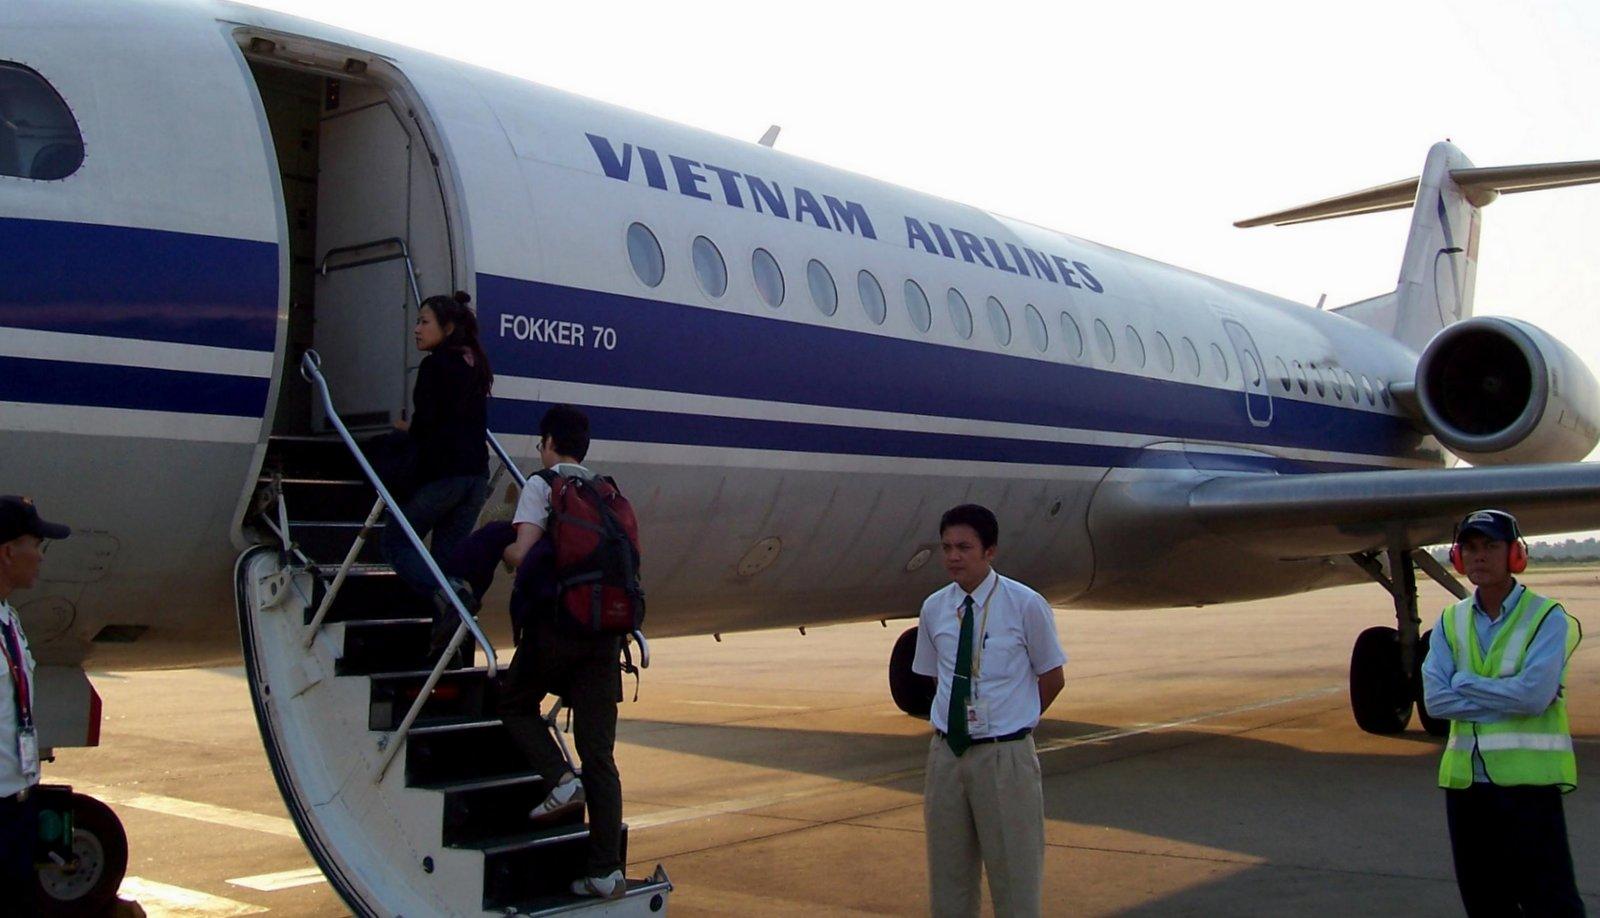 Vietnam Airlines Fokker 70